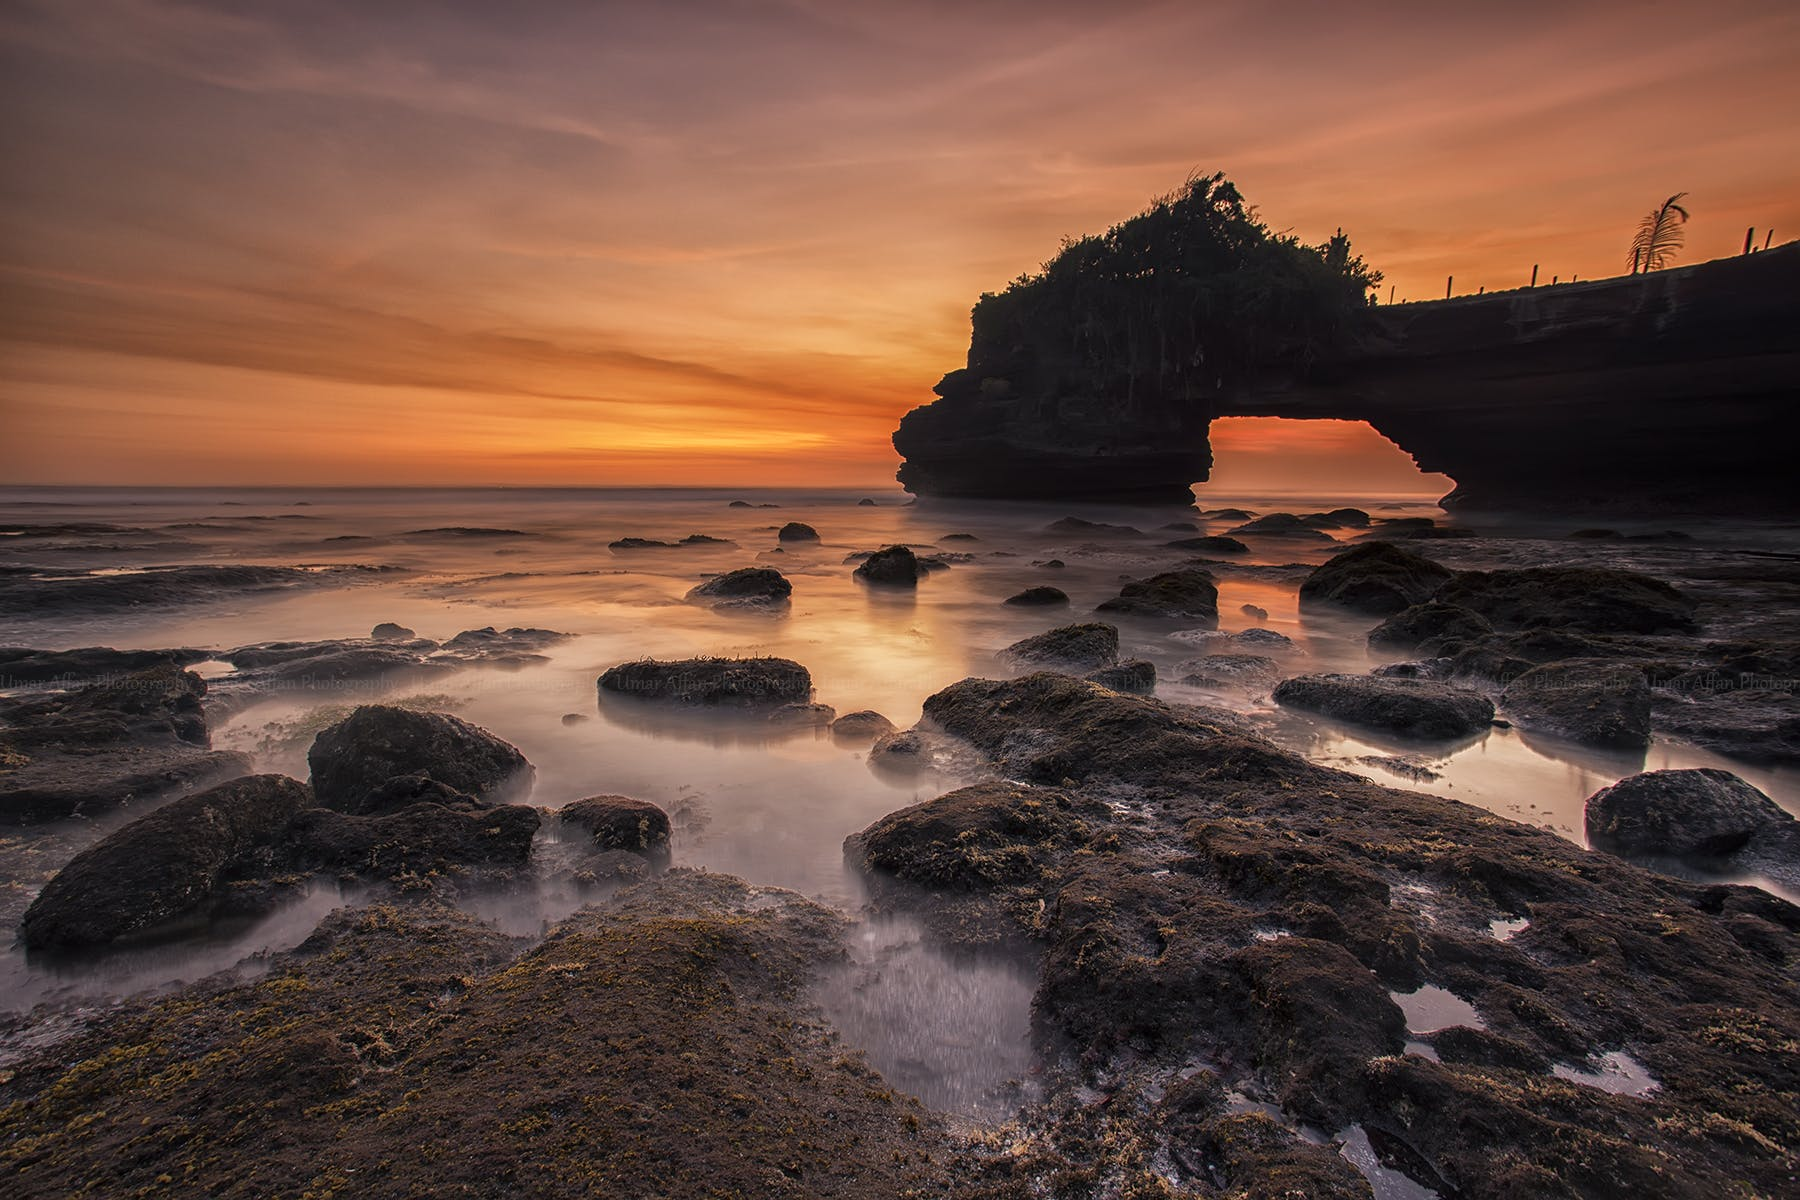 Orange and Yellow Sunset Skies over Grey Seashore Rocks and Calmed Ocean